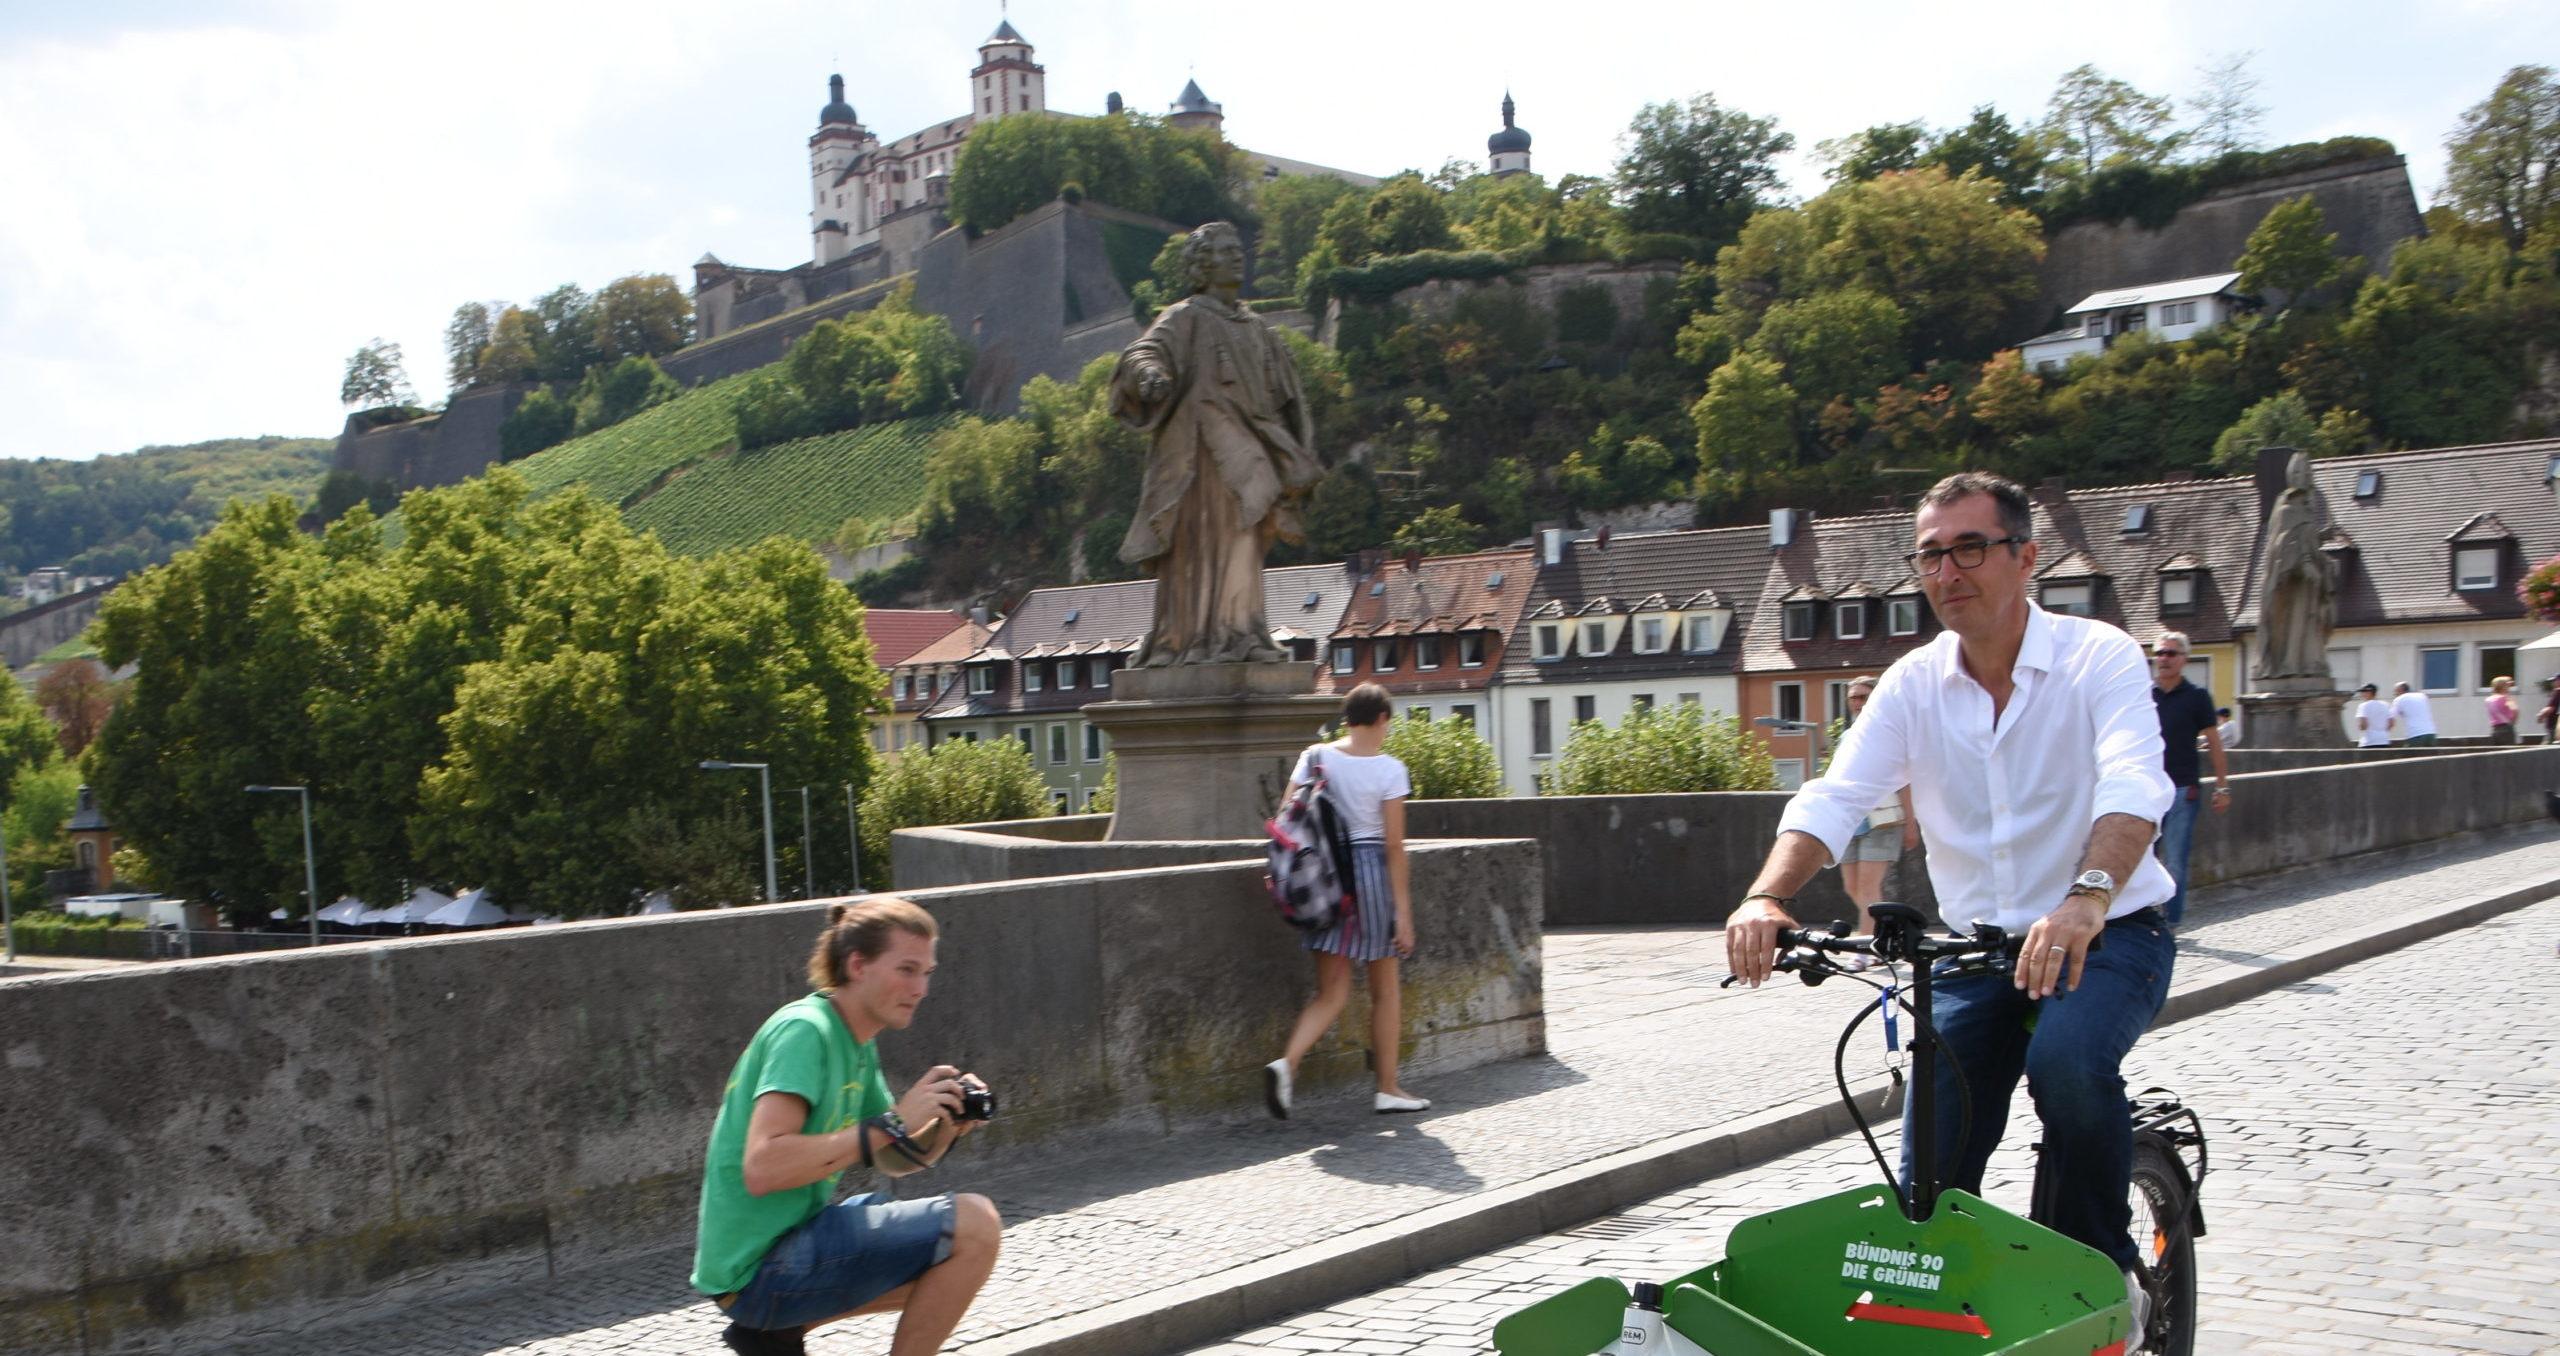 Cem Özdemir fährt Lastend in Würzburg